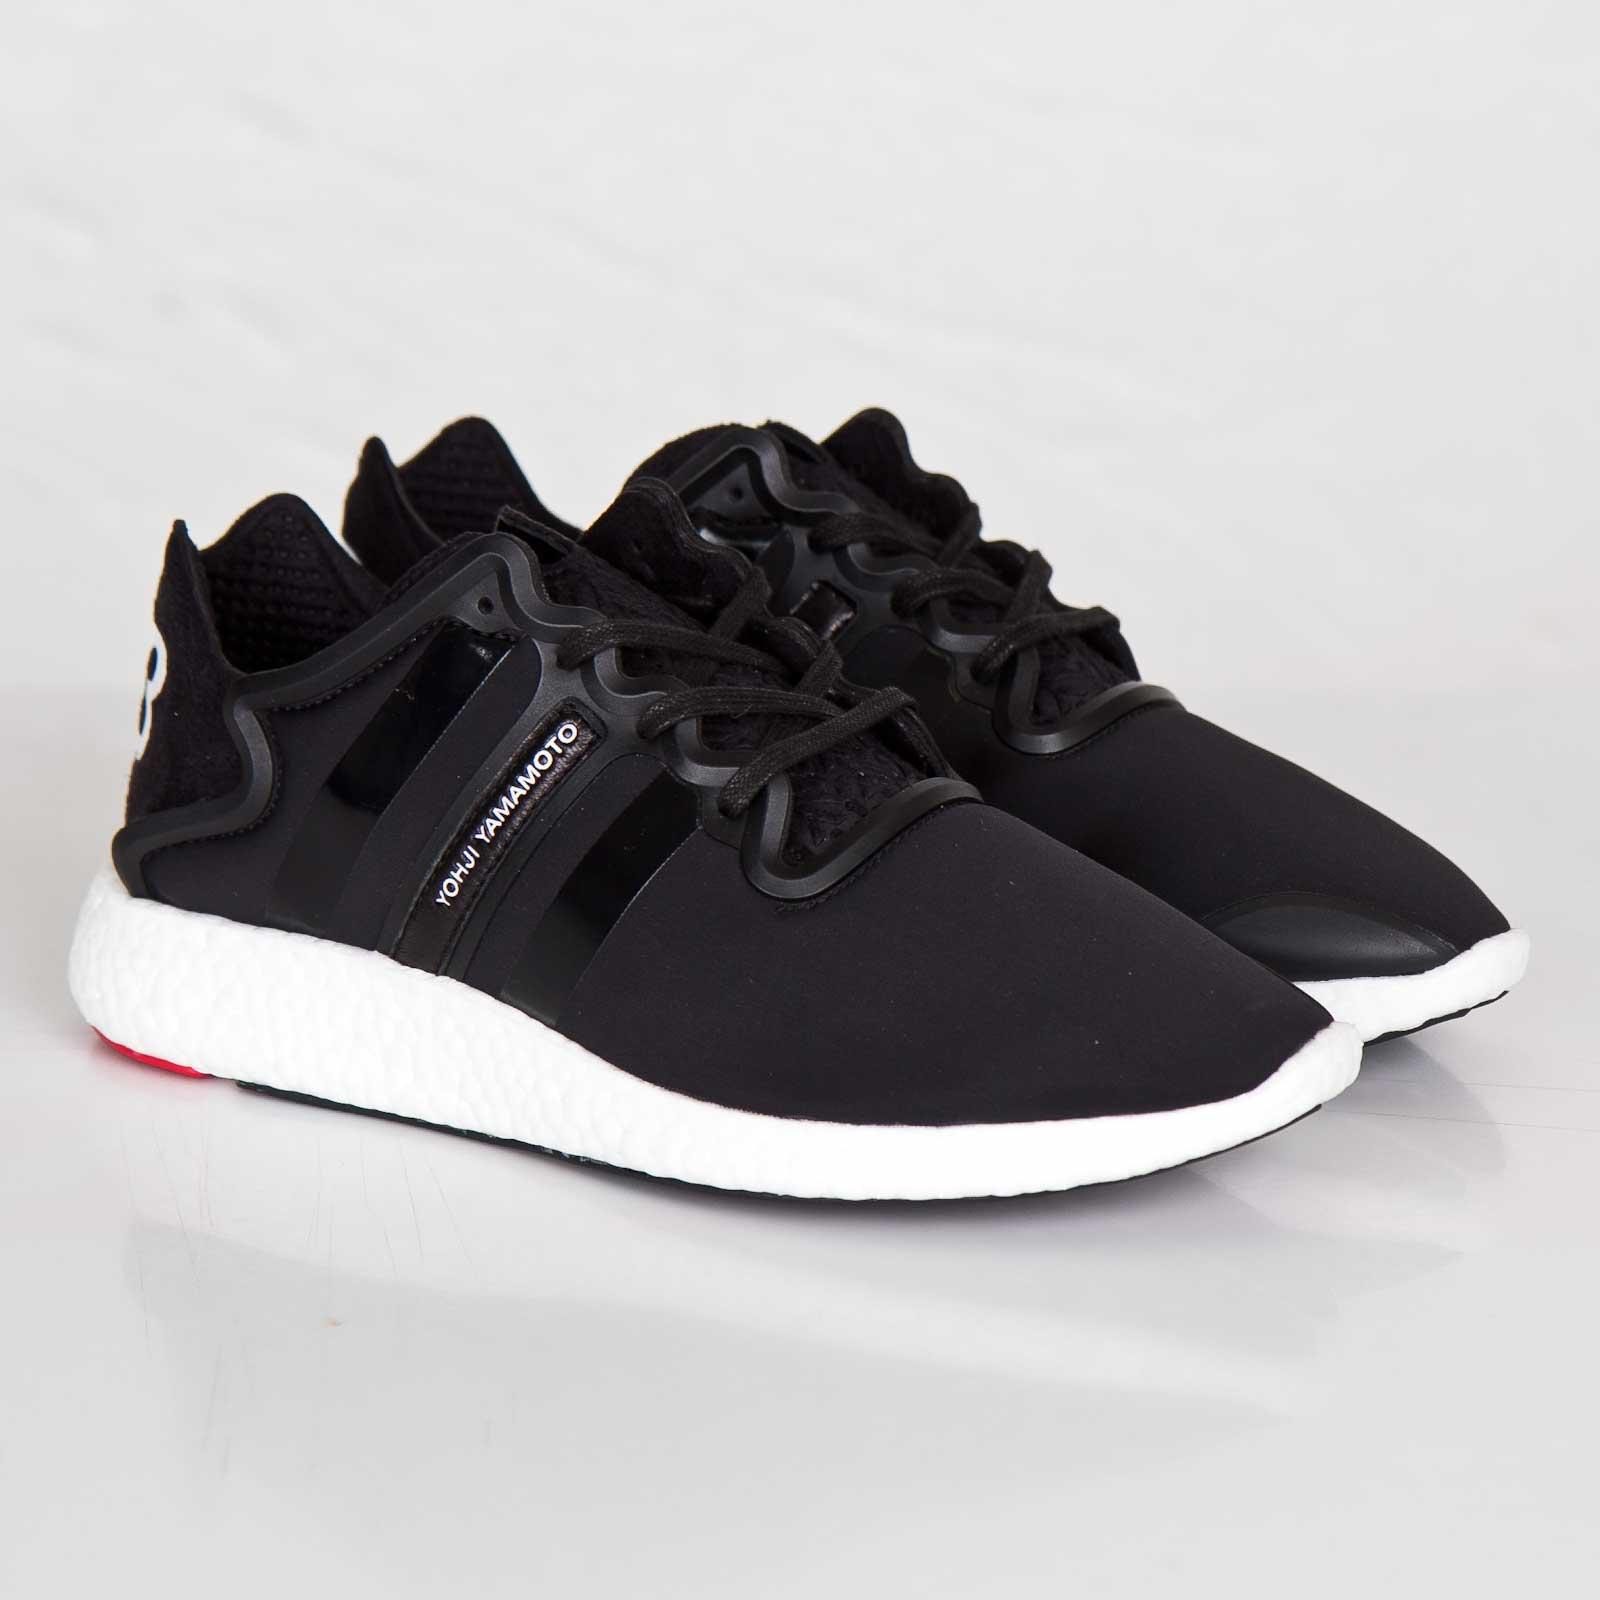 d968d9e3f adidas Y-3 Yohji Boost - M21795 - Sneakersnstuff